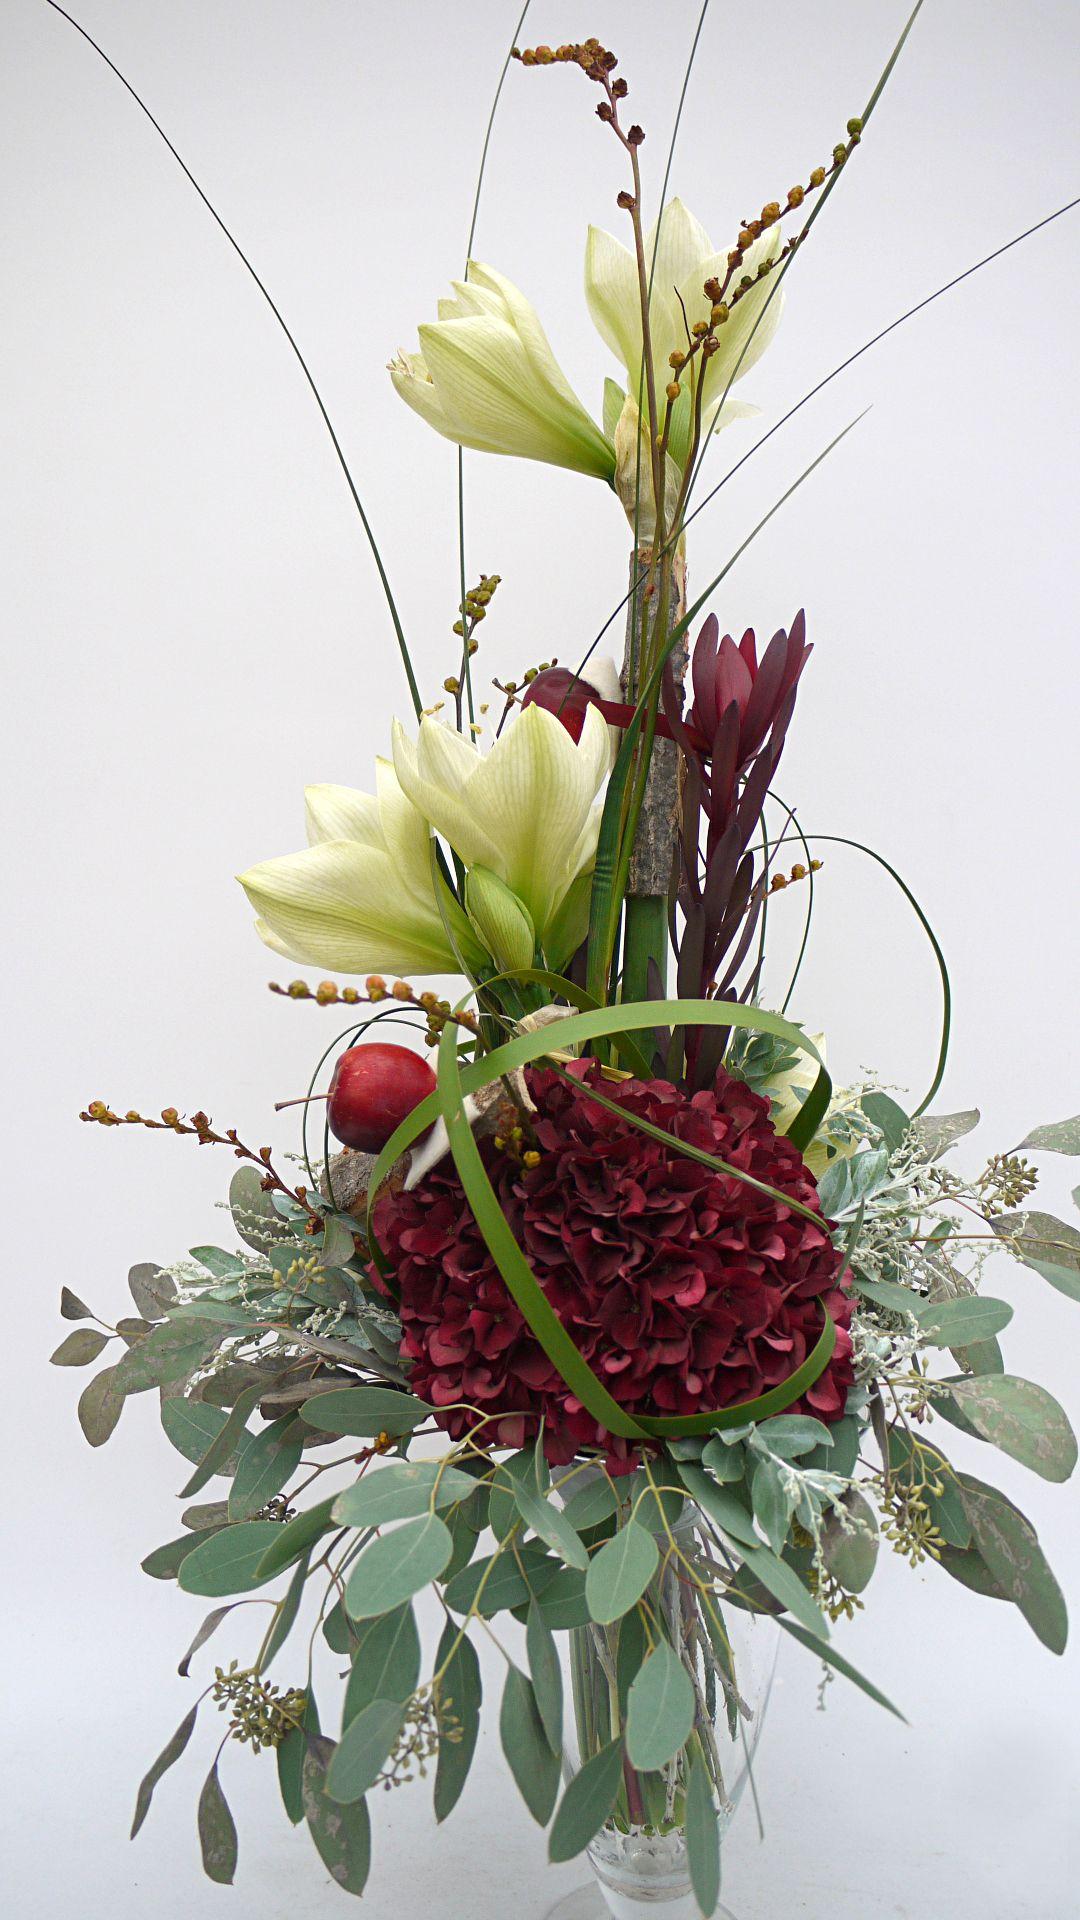 blumengro handel ritzka floristik amaryllis variationen. Black Bedroom Furniture Sets. Home Design Ideas